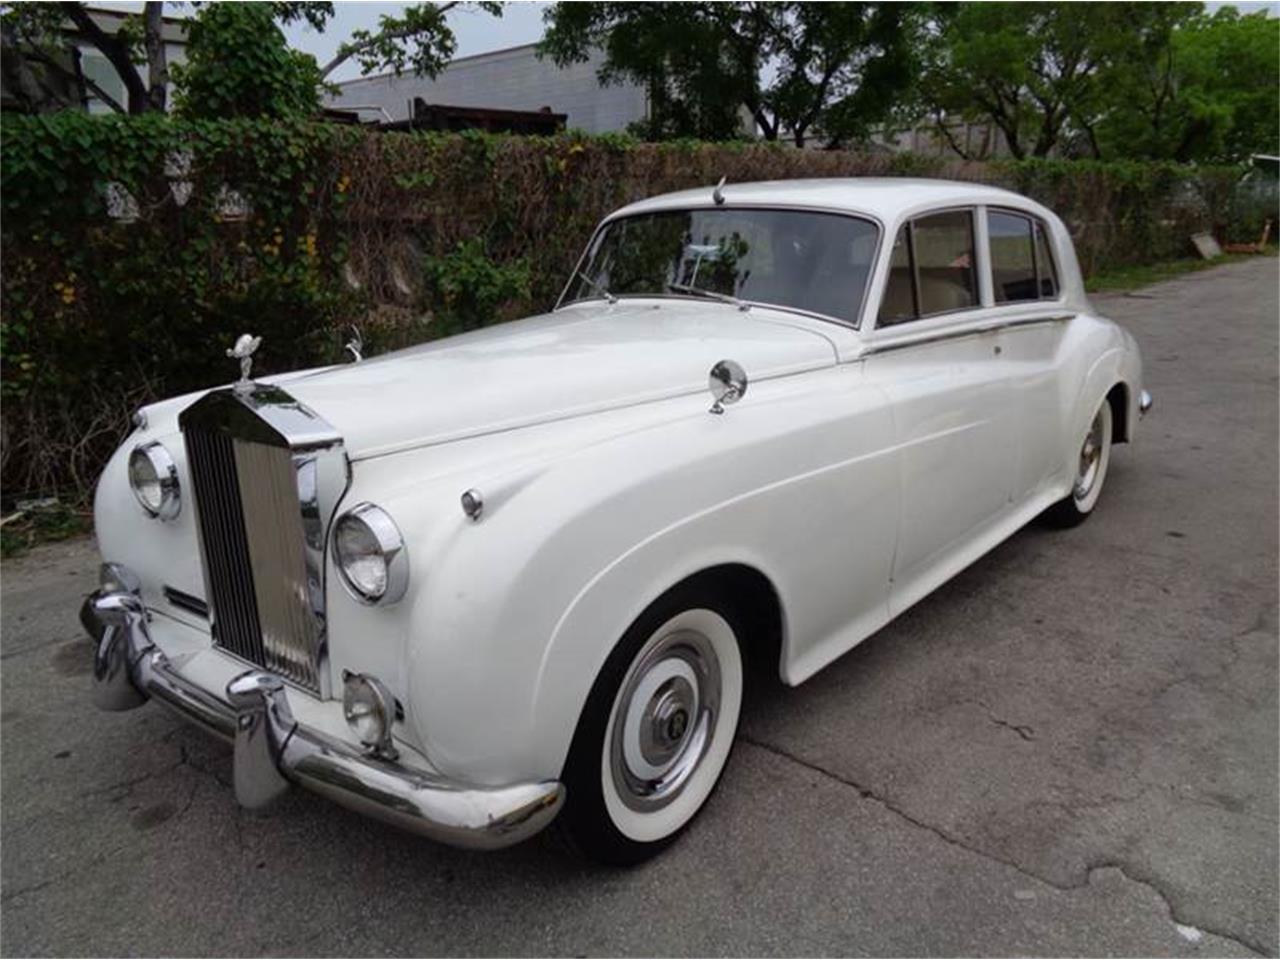 1961 Rolls Royce Silver Cloud For Sale Classiccars Com Cc 1144415